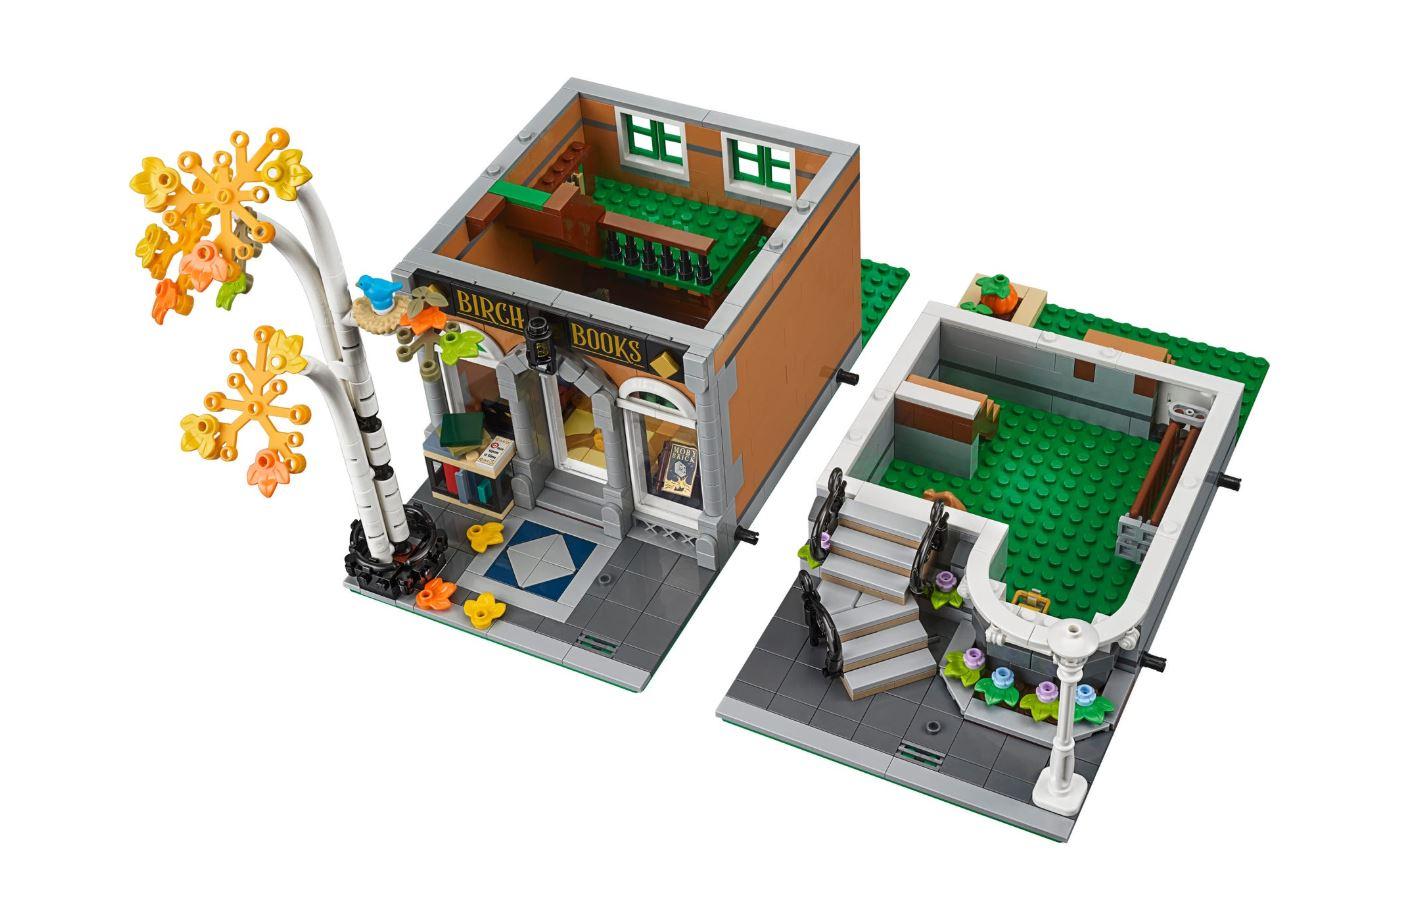 Lego creator expert libreria - 10270 - Creator Expert, LEGO CREATOR EXPERT